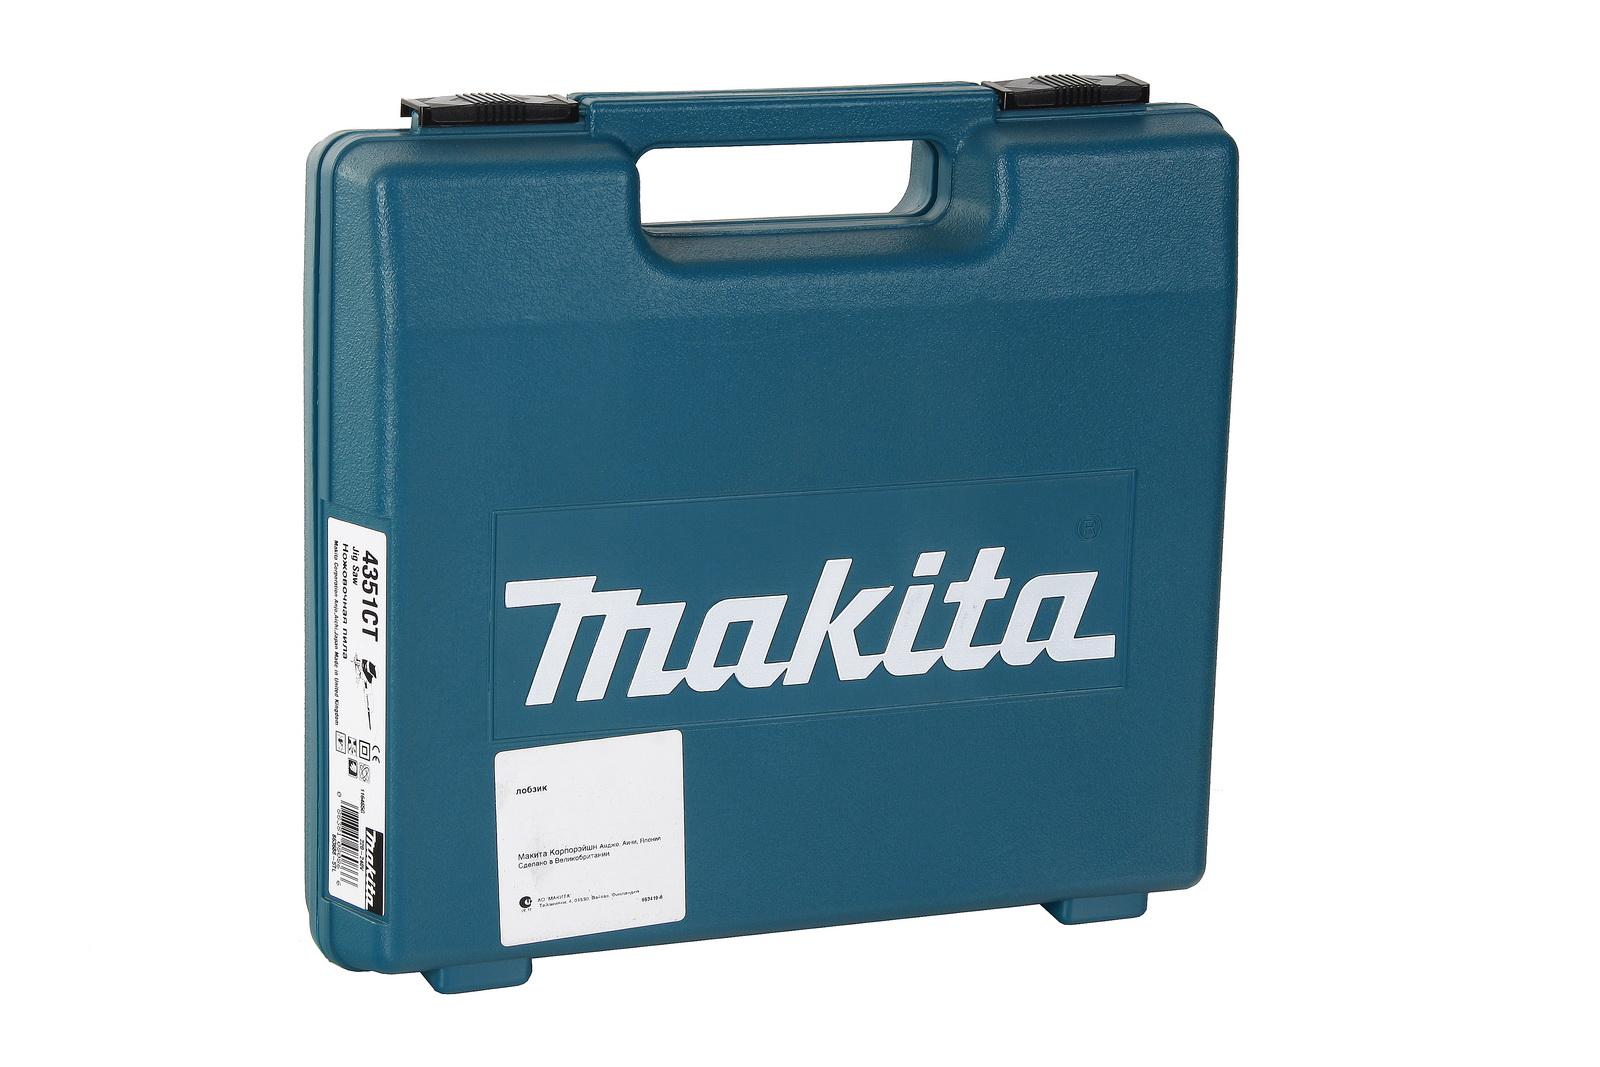 Лобзик Makita 4351ct